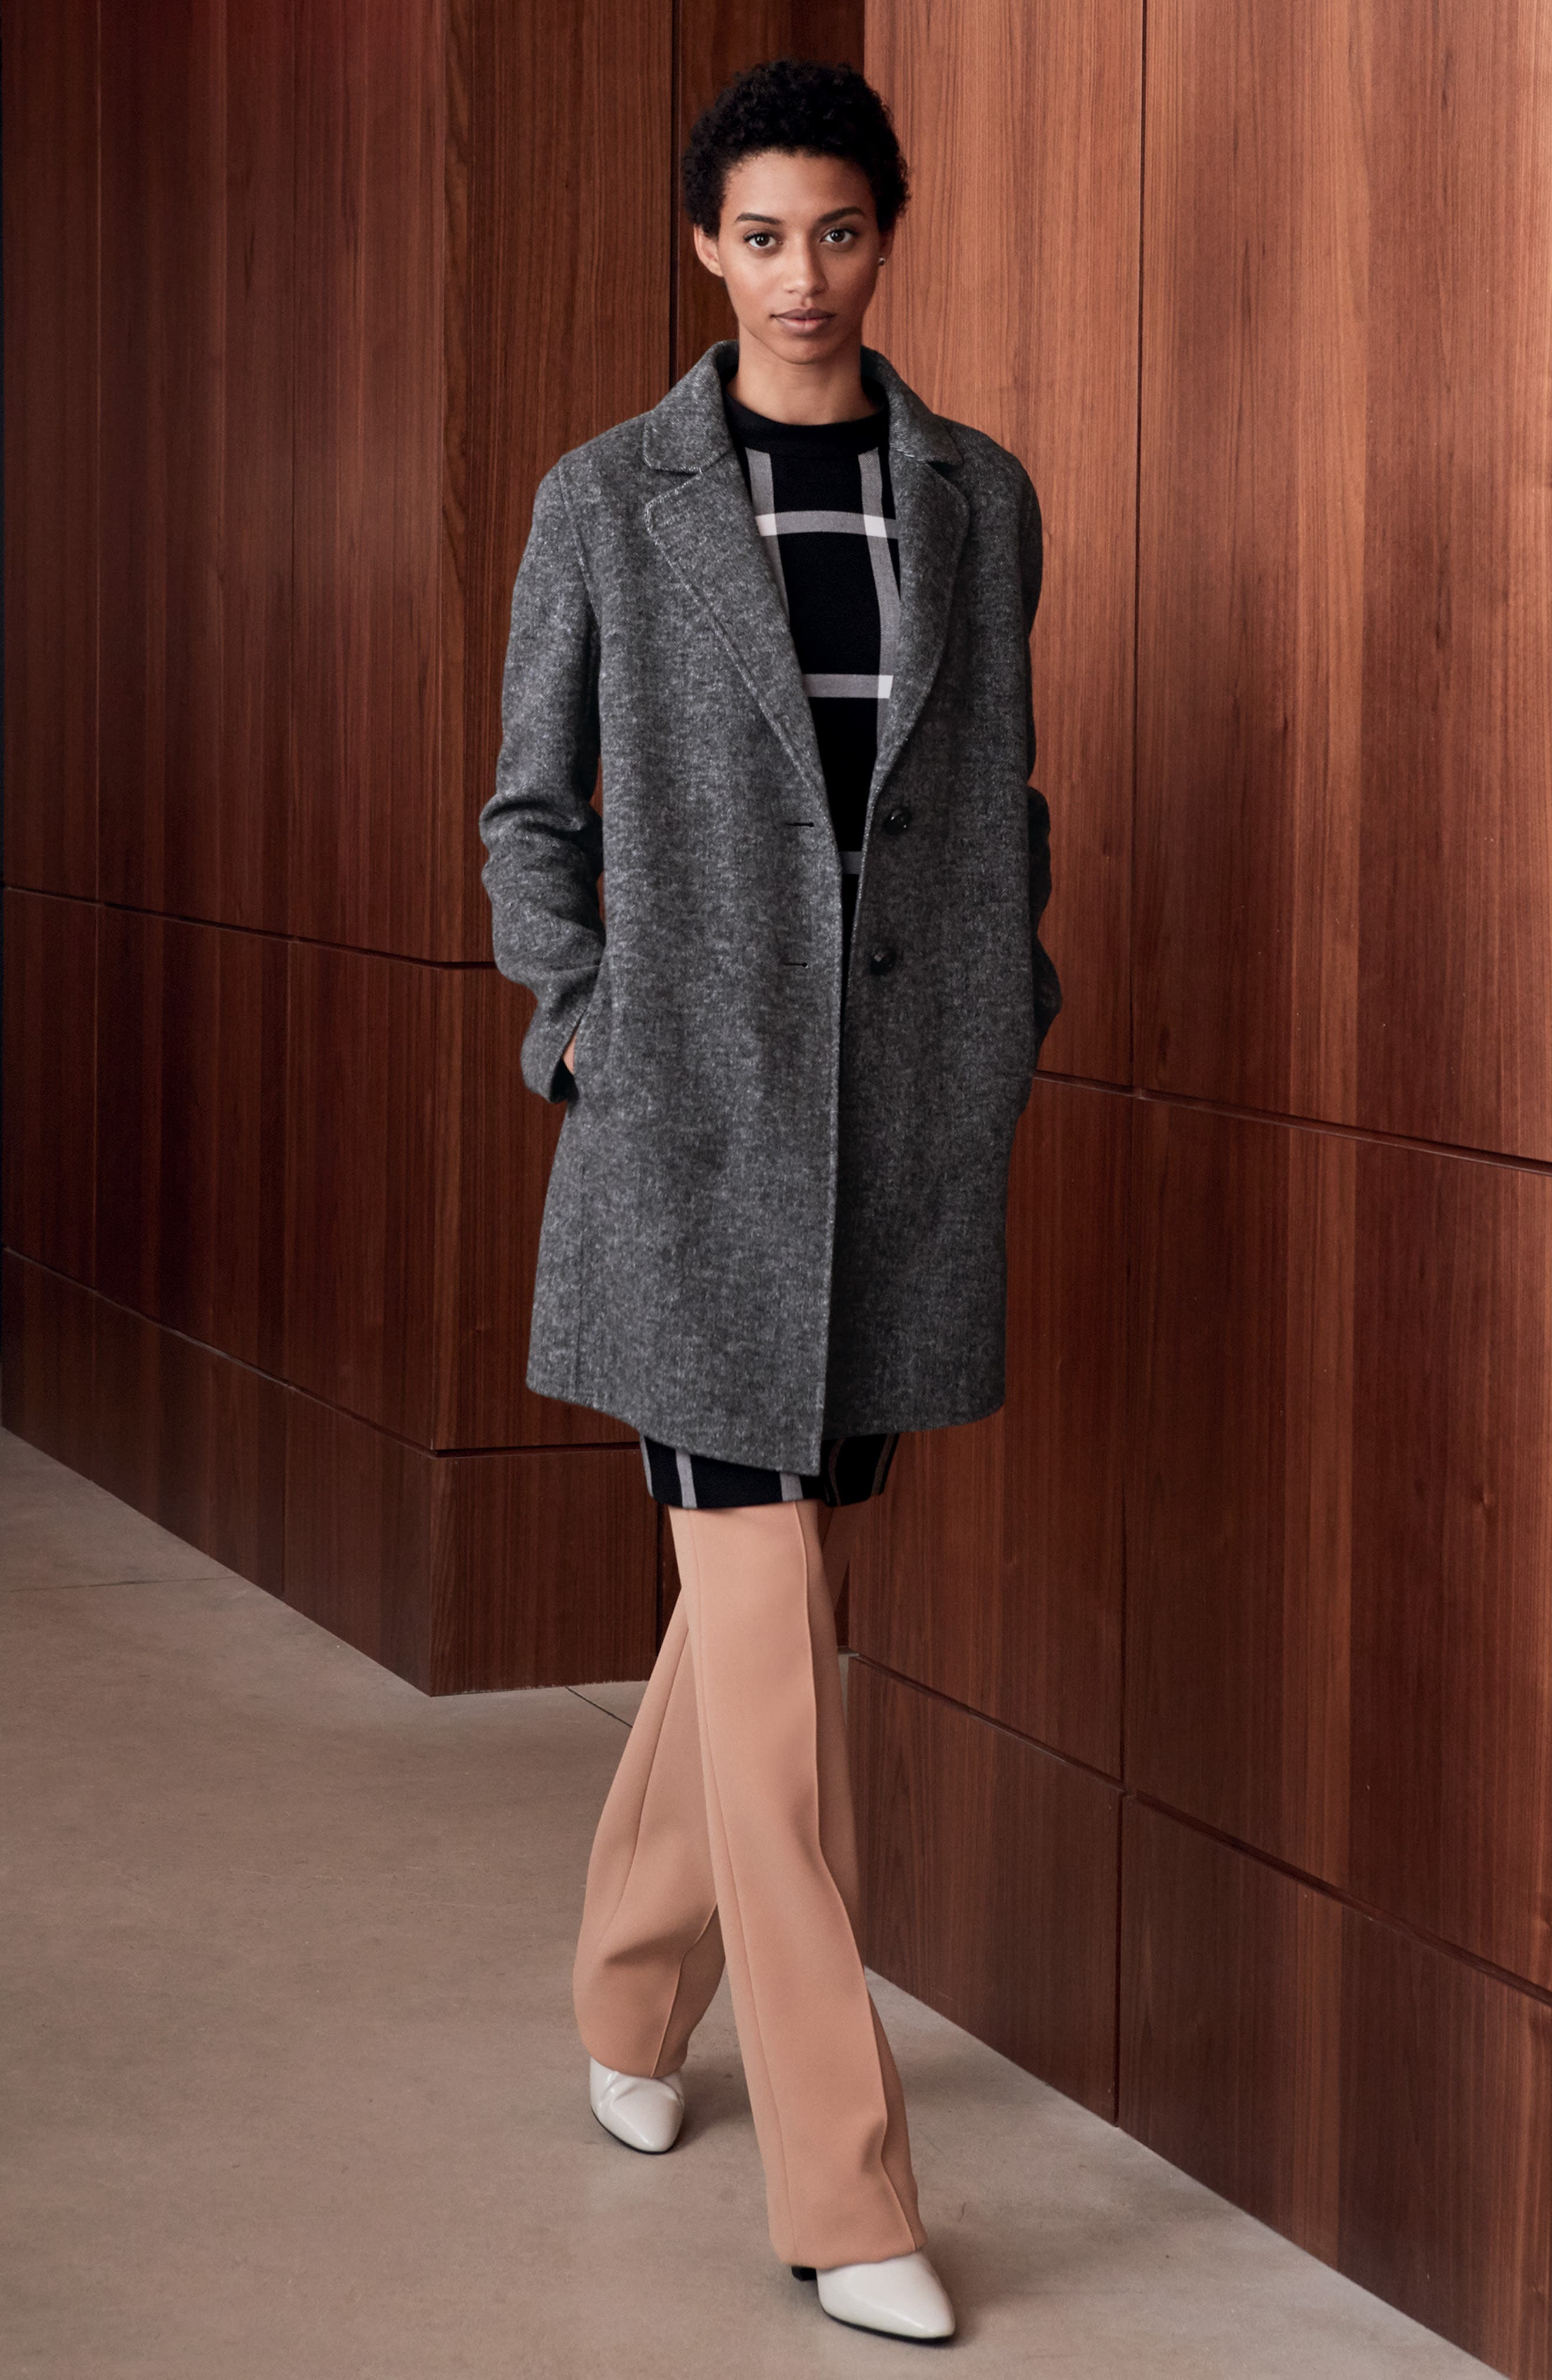 Tahari Blazer, BOSS dress & Diane von Furstenberg Pants